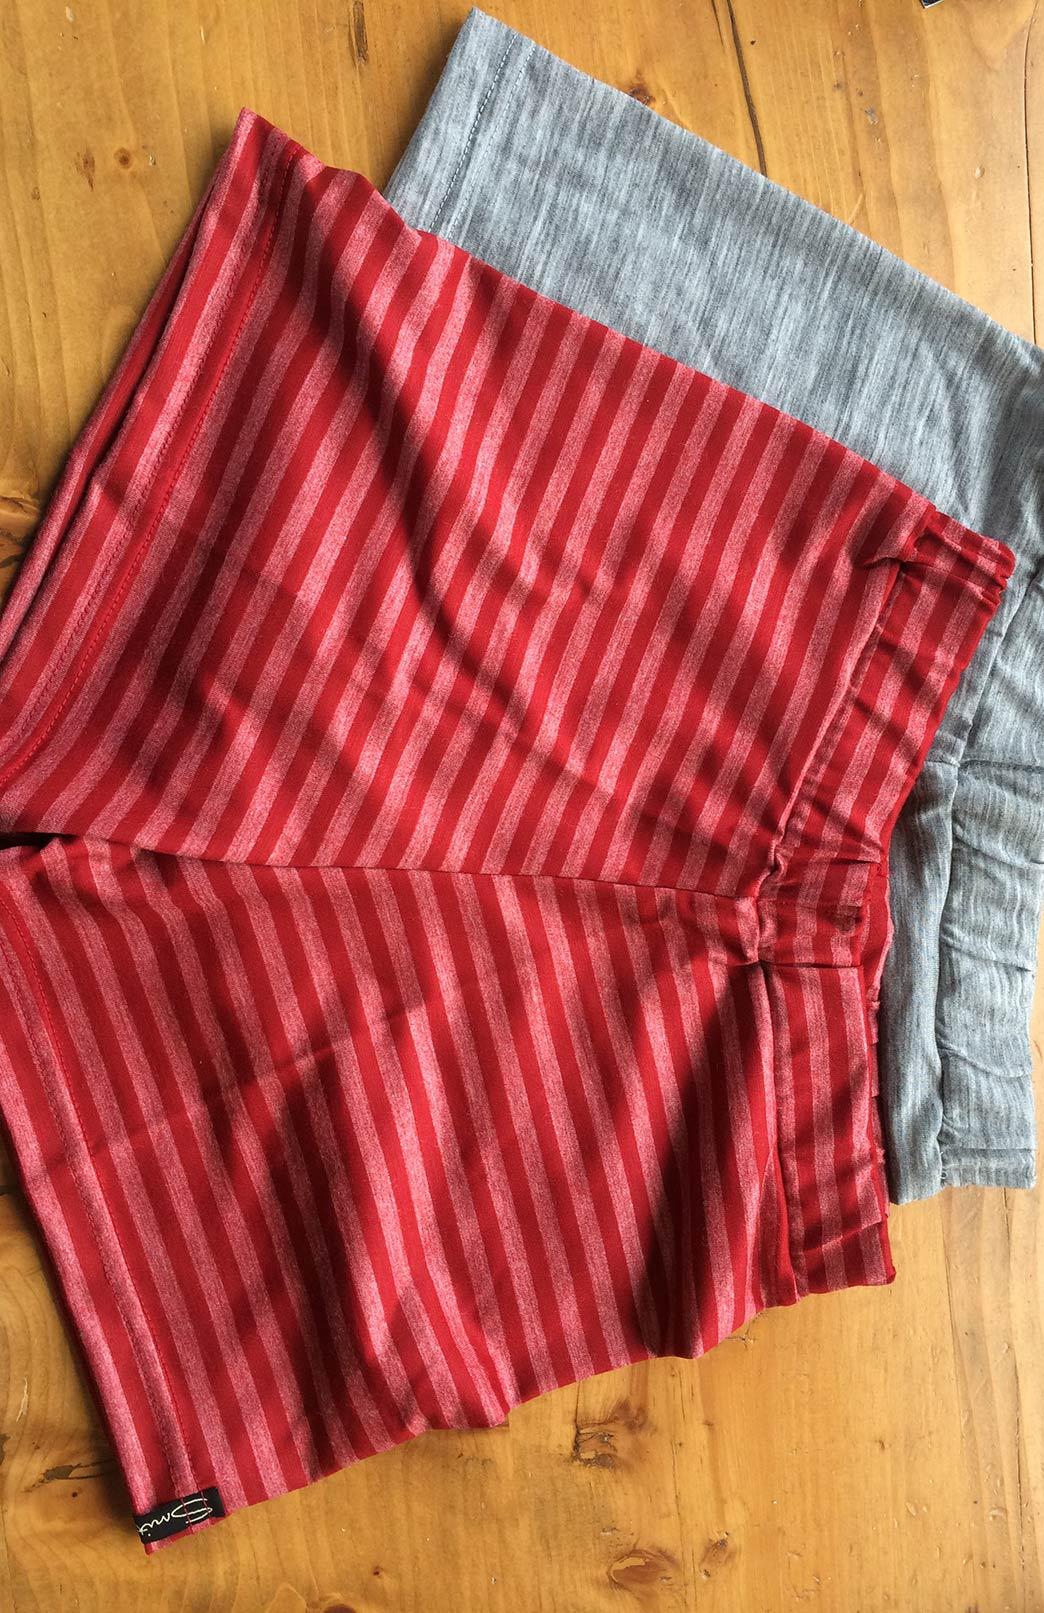 Boxer Shorts - Women's Merino Wool Modal Blend Comfort Fit Boxer Shorts - Smitten Merino Tasmania Australia